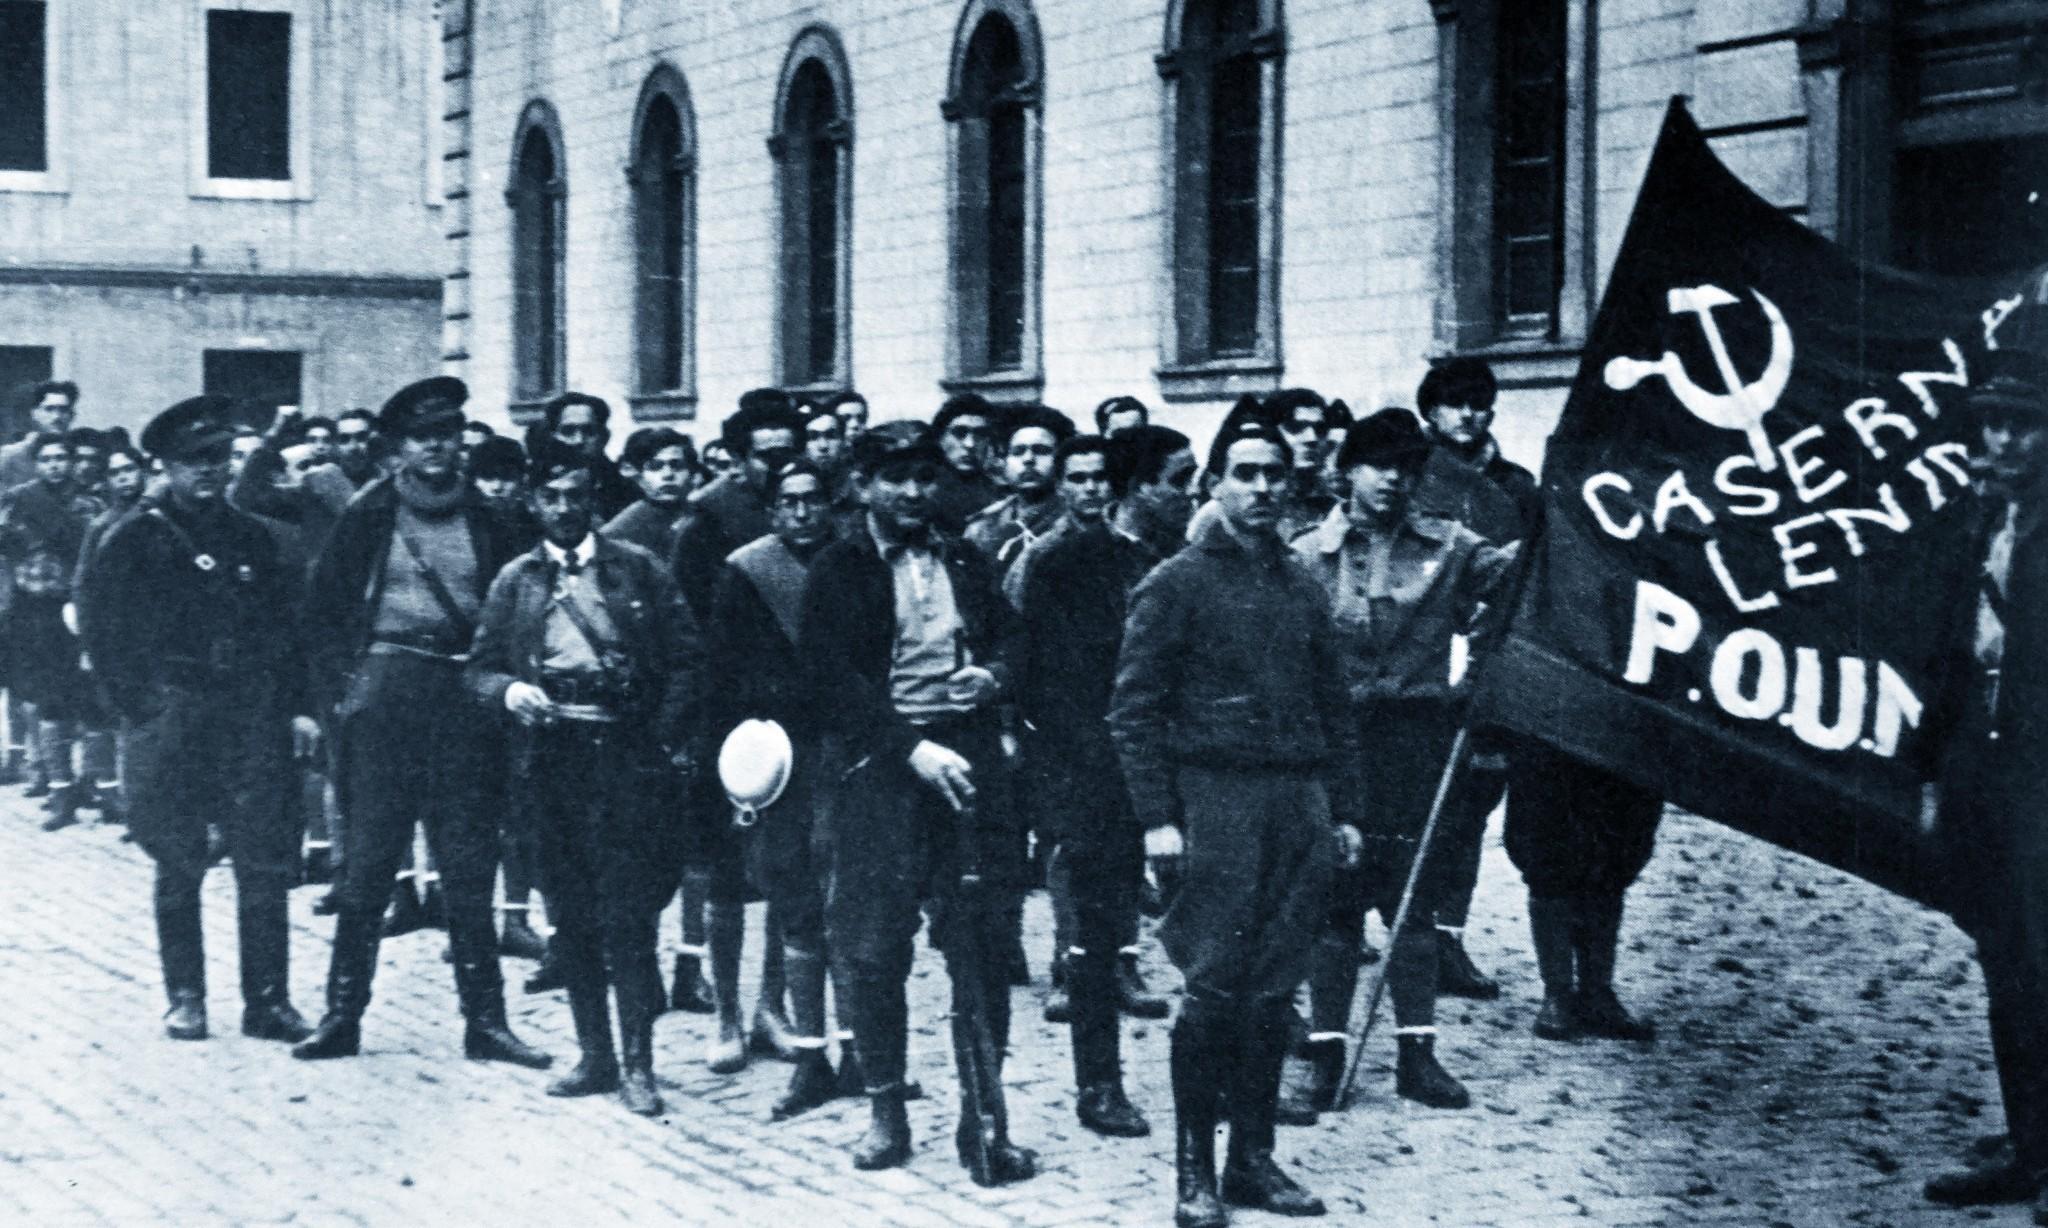 George Orwell's Spanish civil war memoir is a classic, but is it bad history?